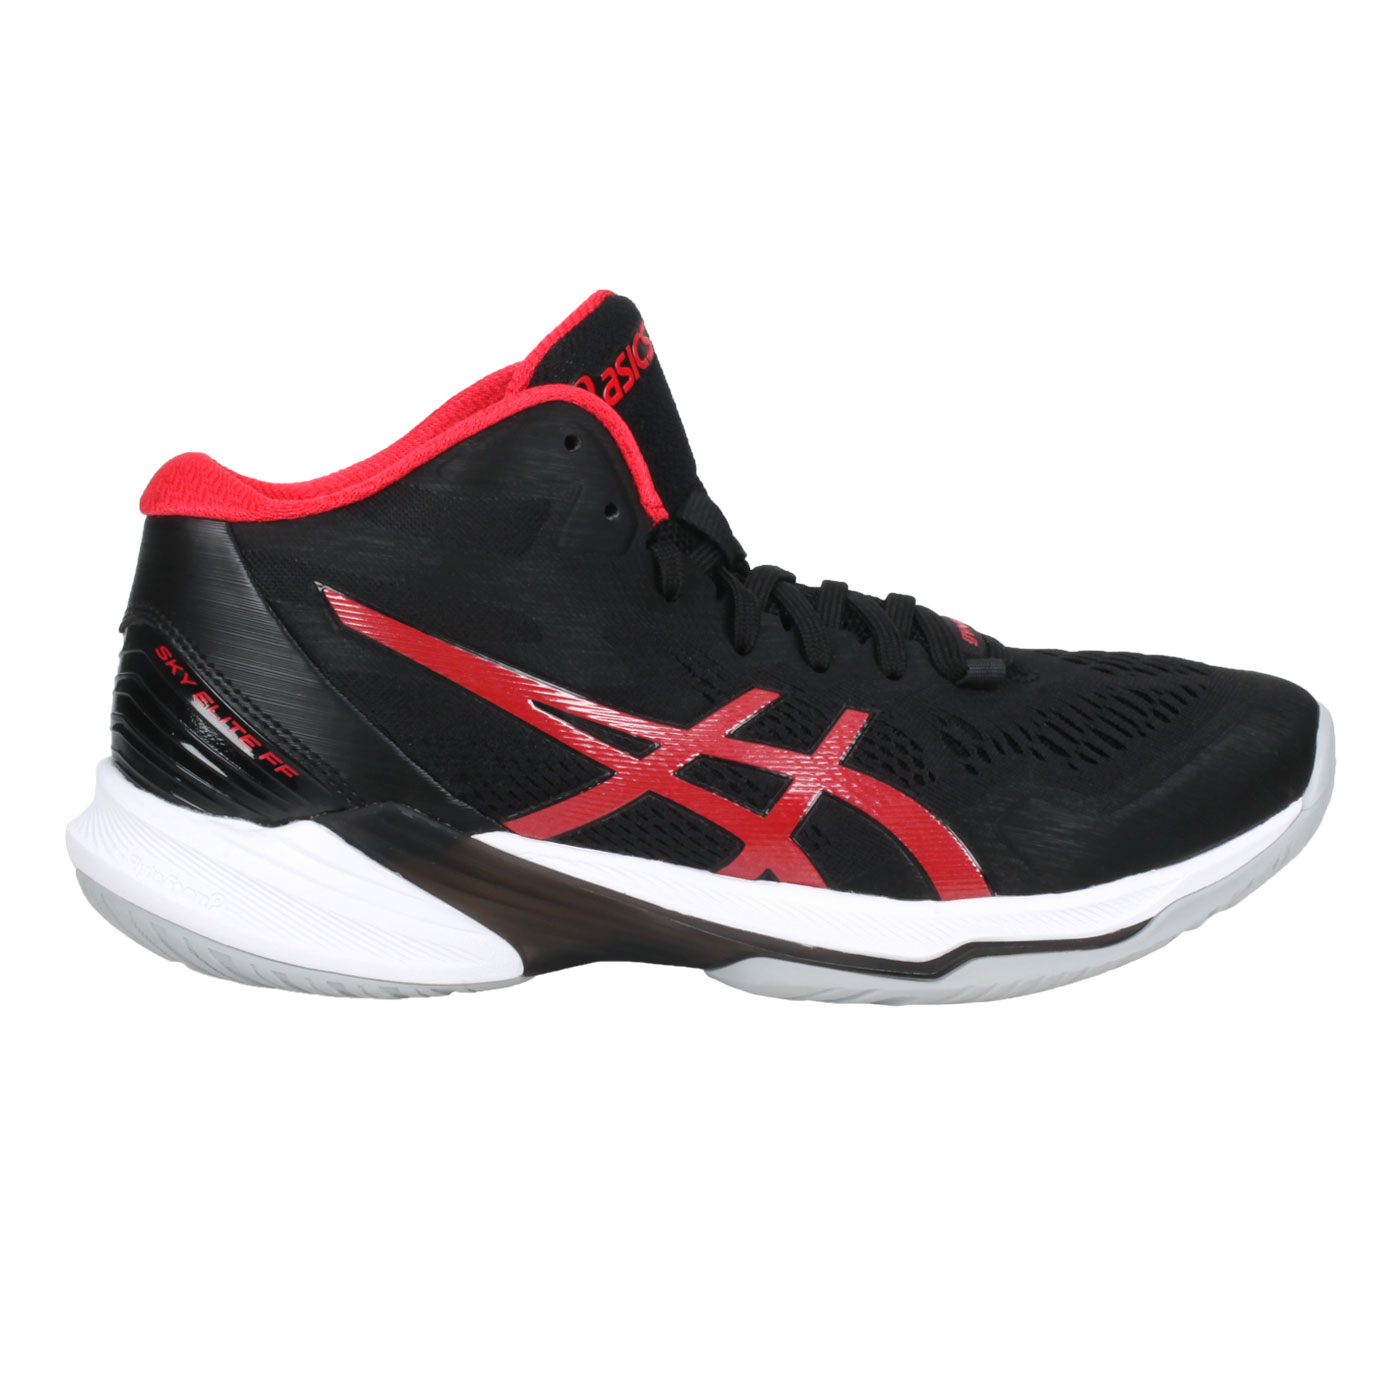 ASICS 特定-男款排羽球鞋  @SKY ELITE FF MT 2@1051A065-001 - 黑紅